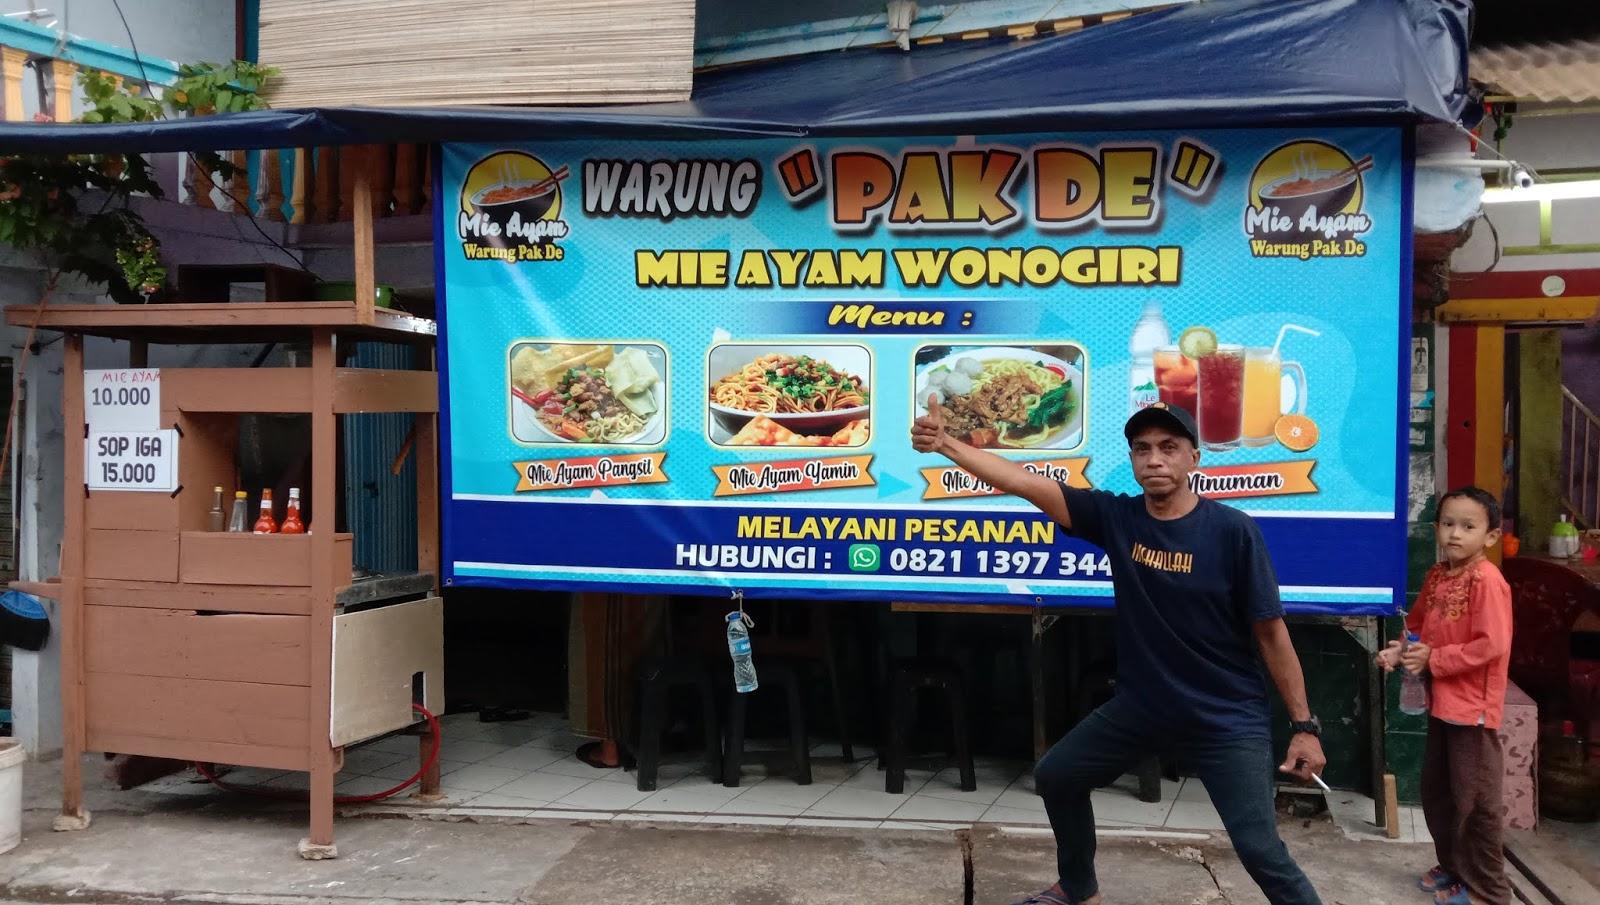 Mie Ayam Wonogiri Warung Pak De